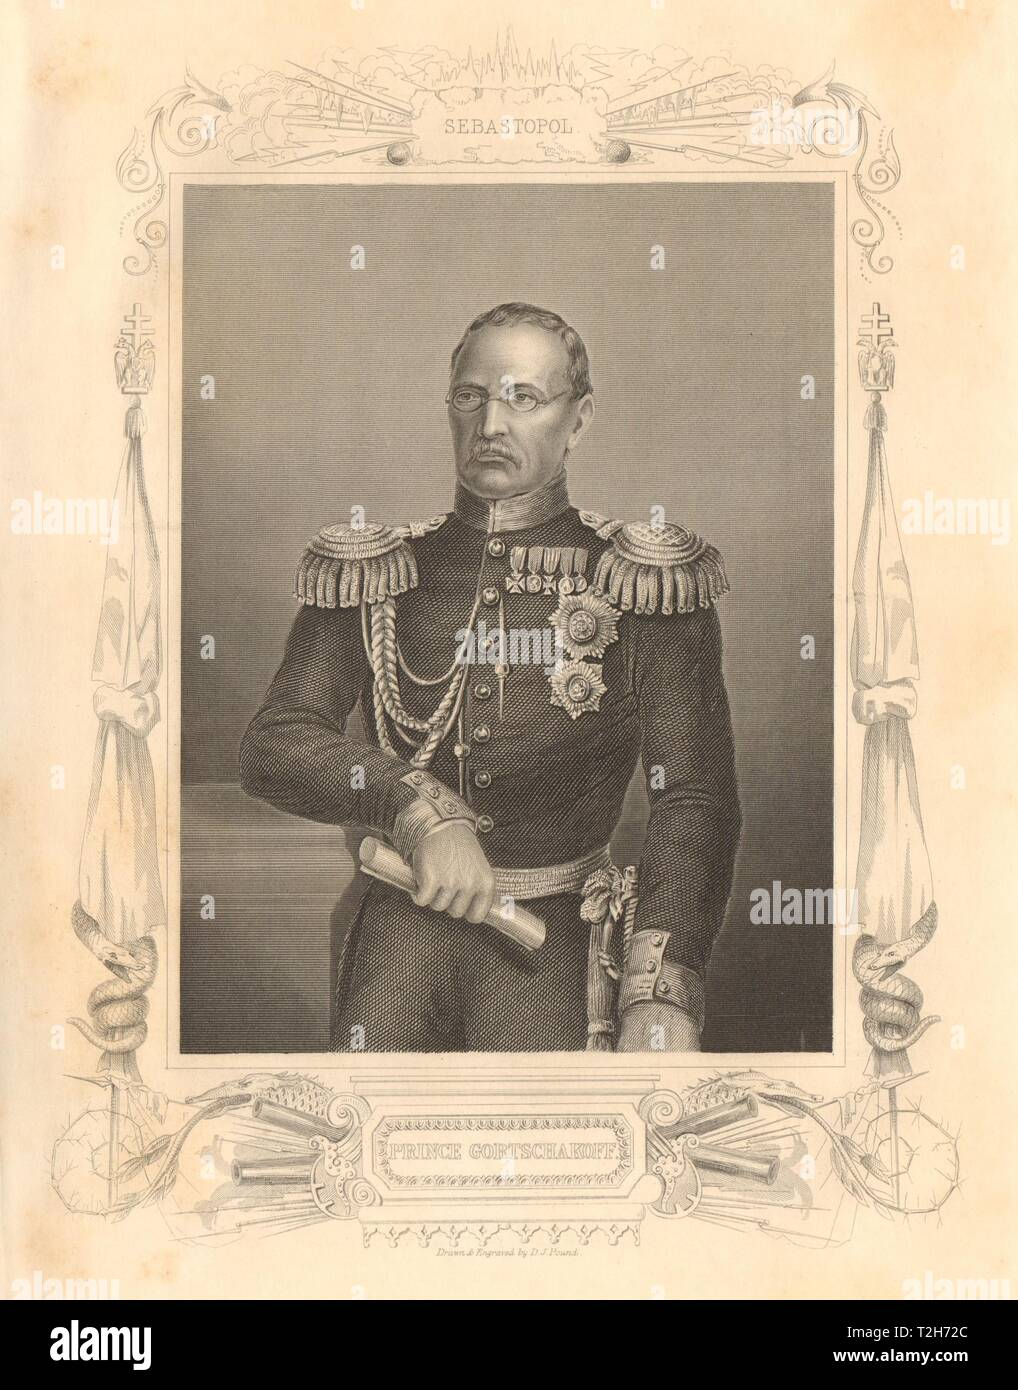 CRIMEAN WAR. Prince Alexander Mikhailovich Gorchakov 1860 old antique print Stock Photo